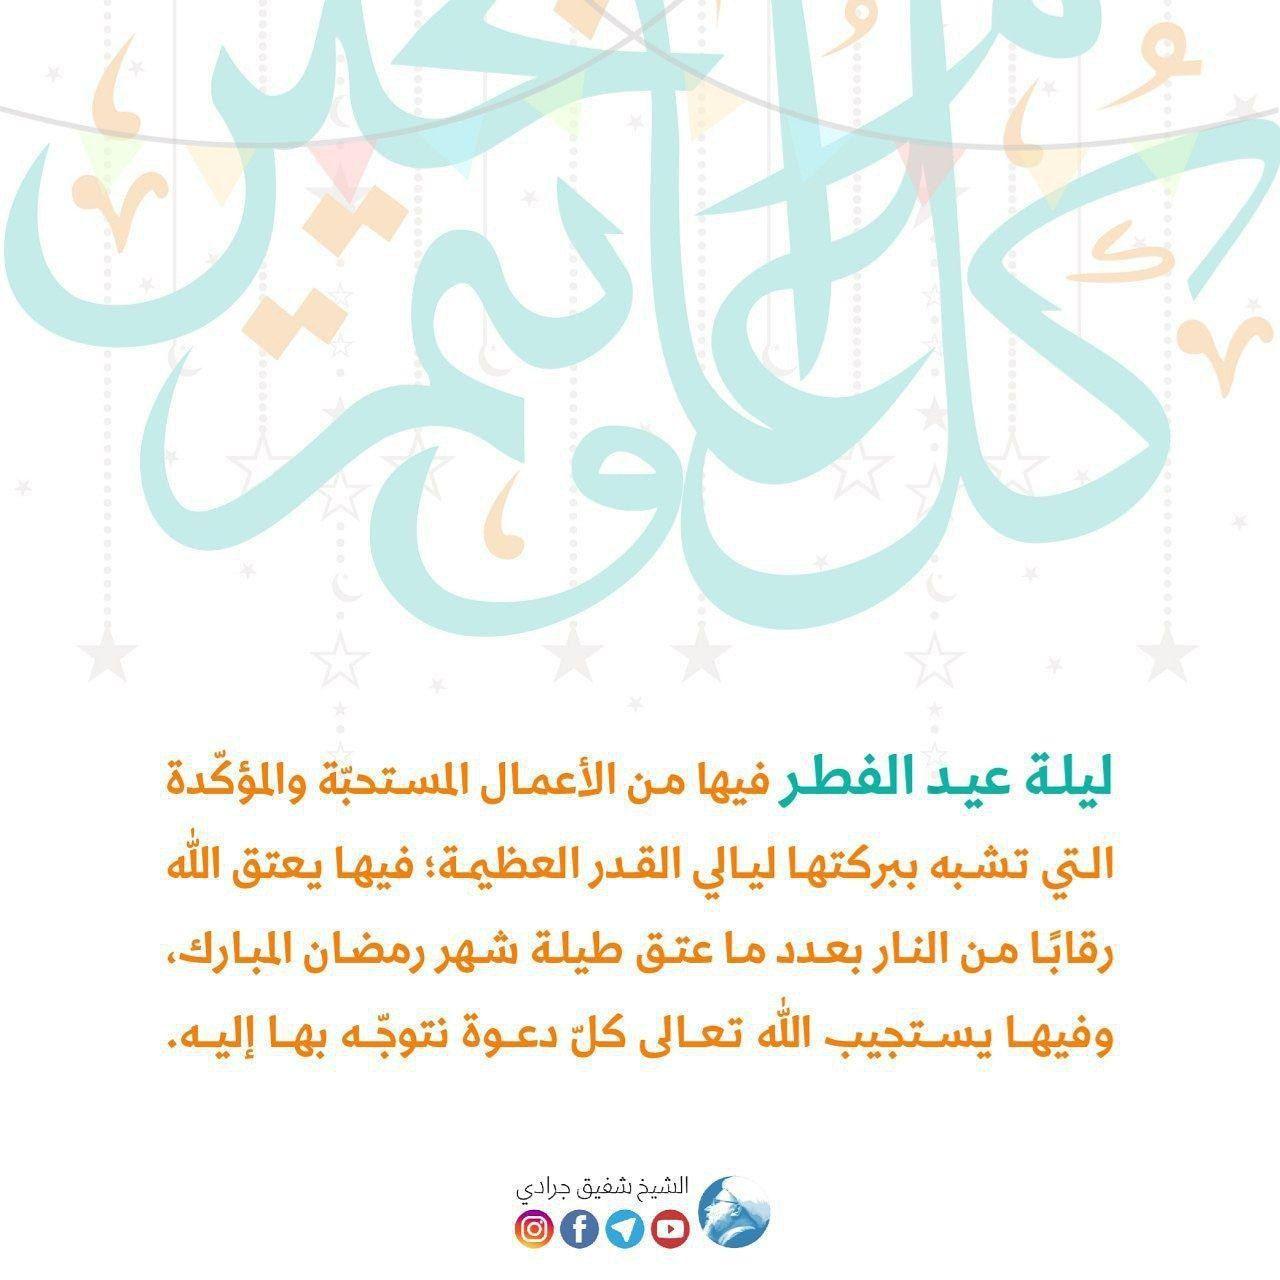 Pin By Abomohammad On مناسبات وولادات وشهادات وفيات أهل البيت عليهم السلام